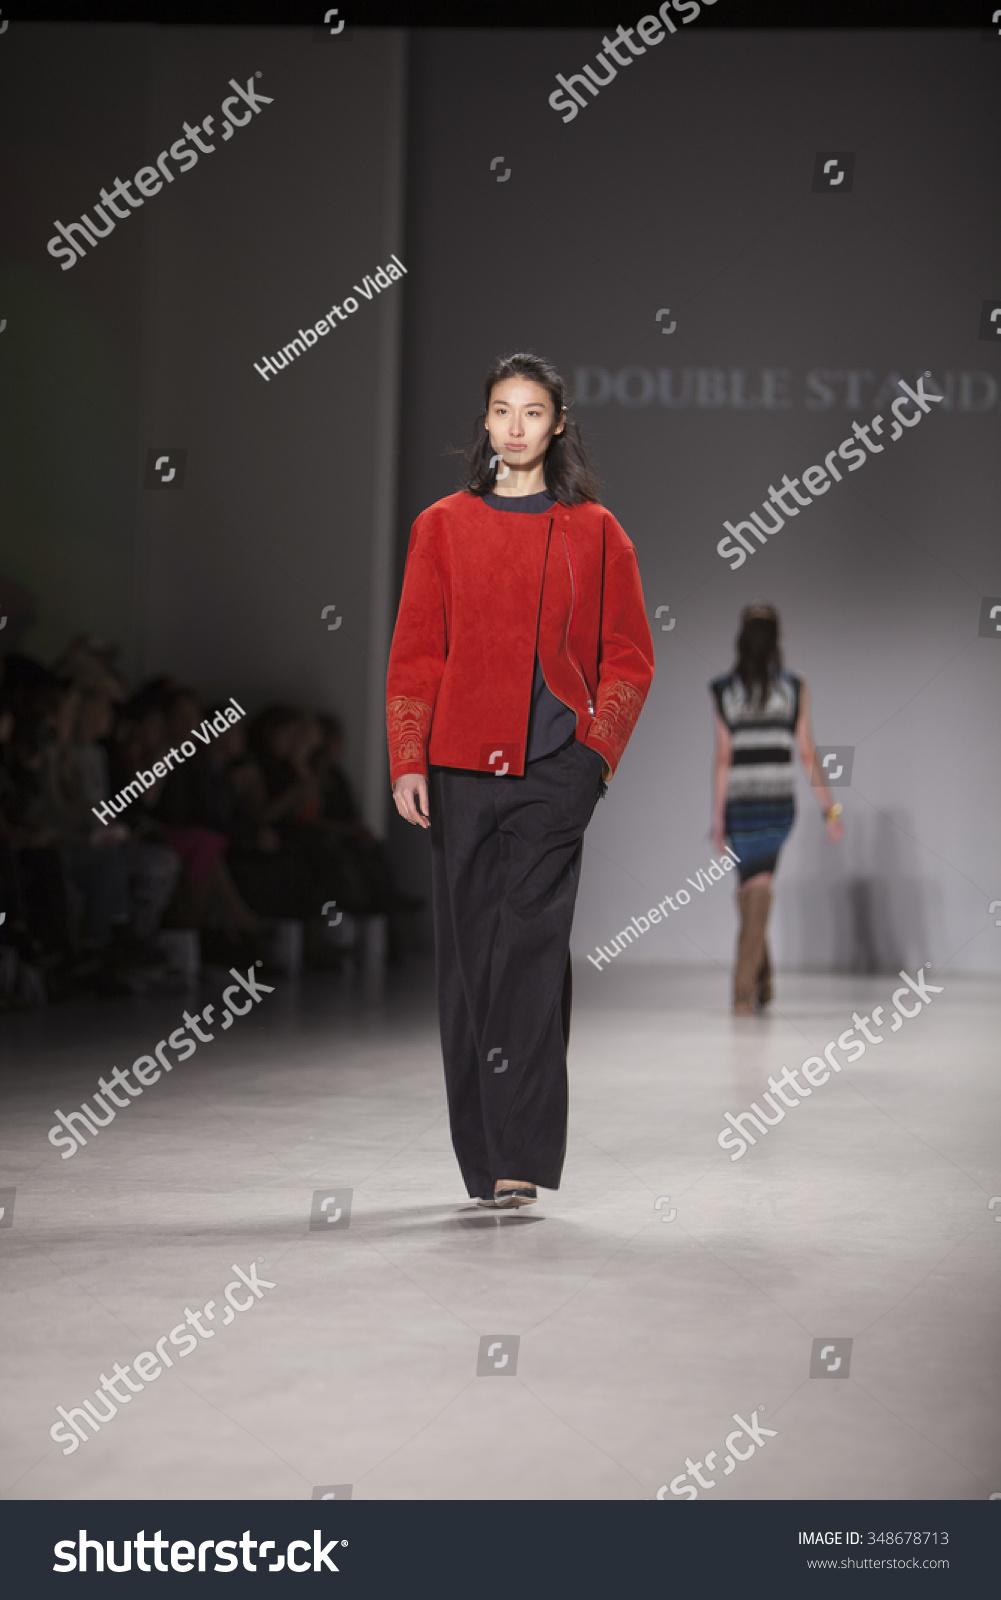 Fashion Expo Standsaur : Model walks runway double standard clothing stock photo